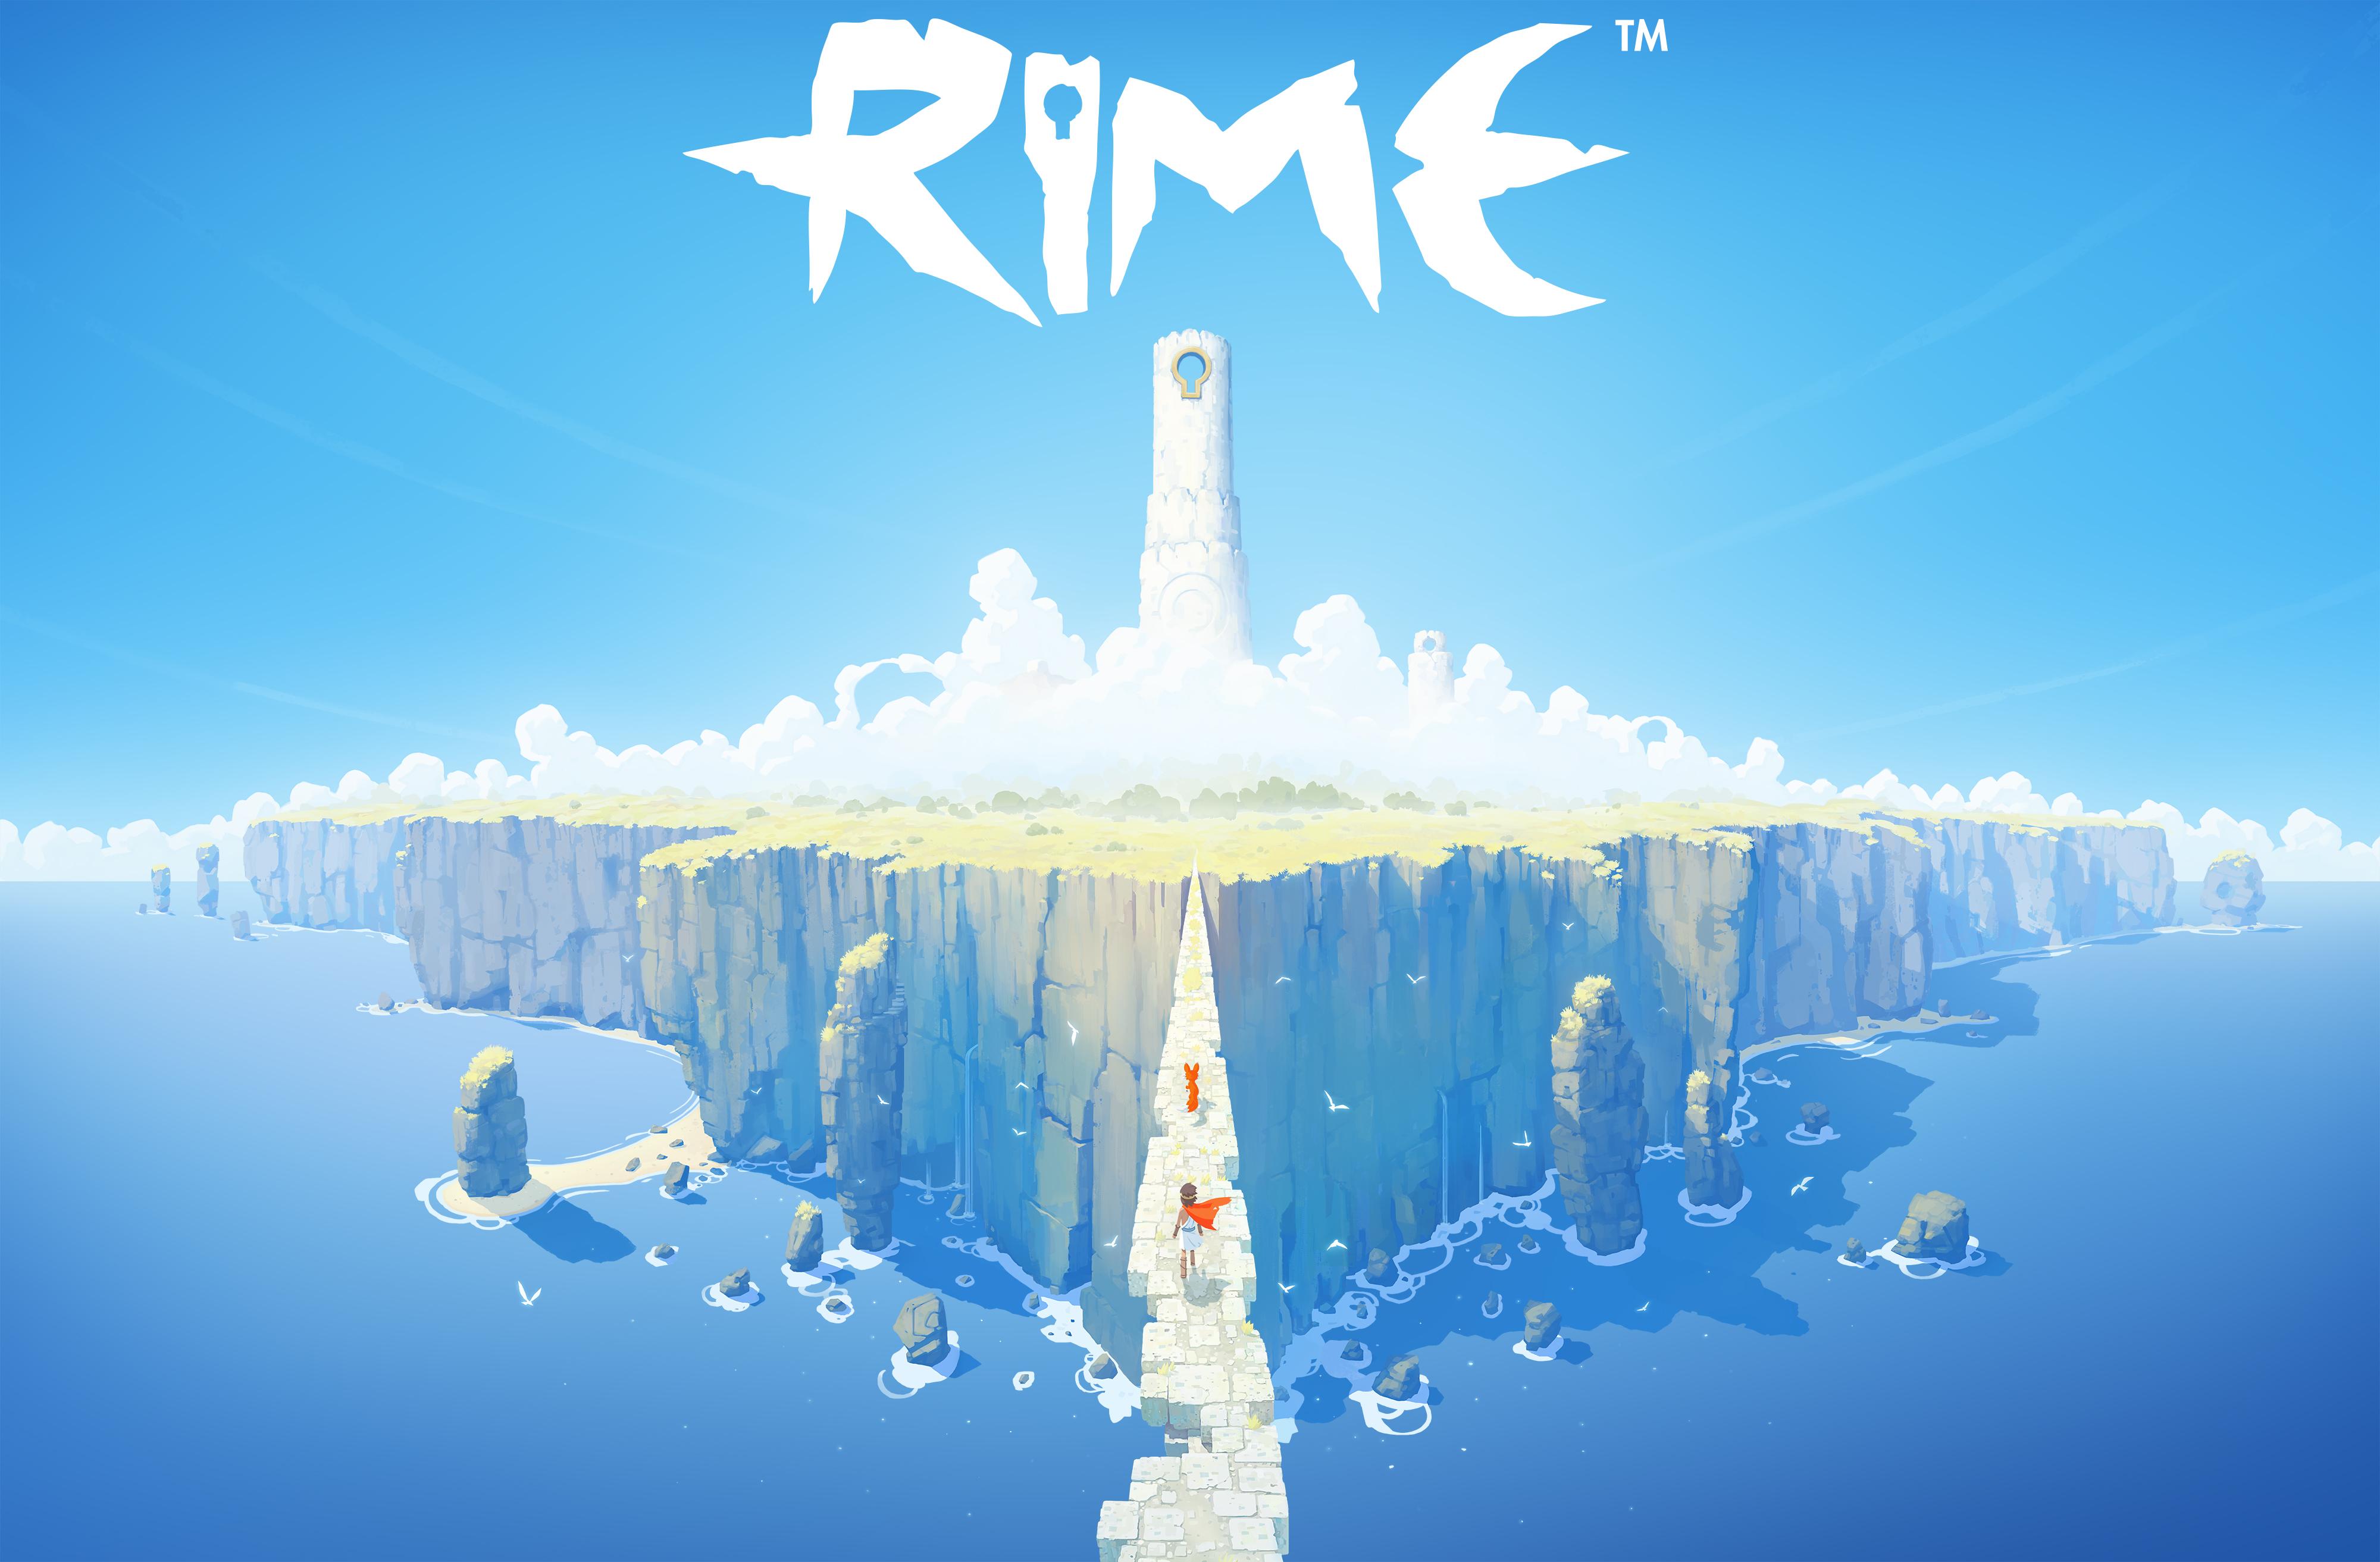 Rime picks up new publisher, eyes 2017 release